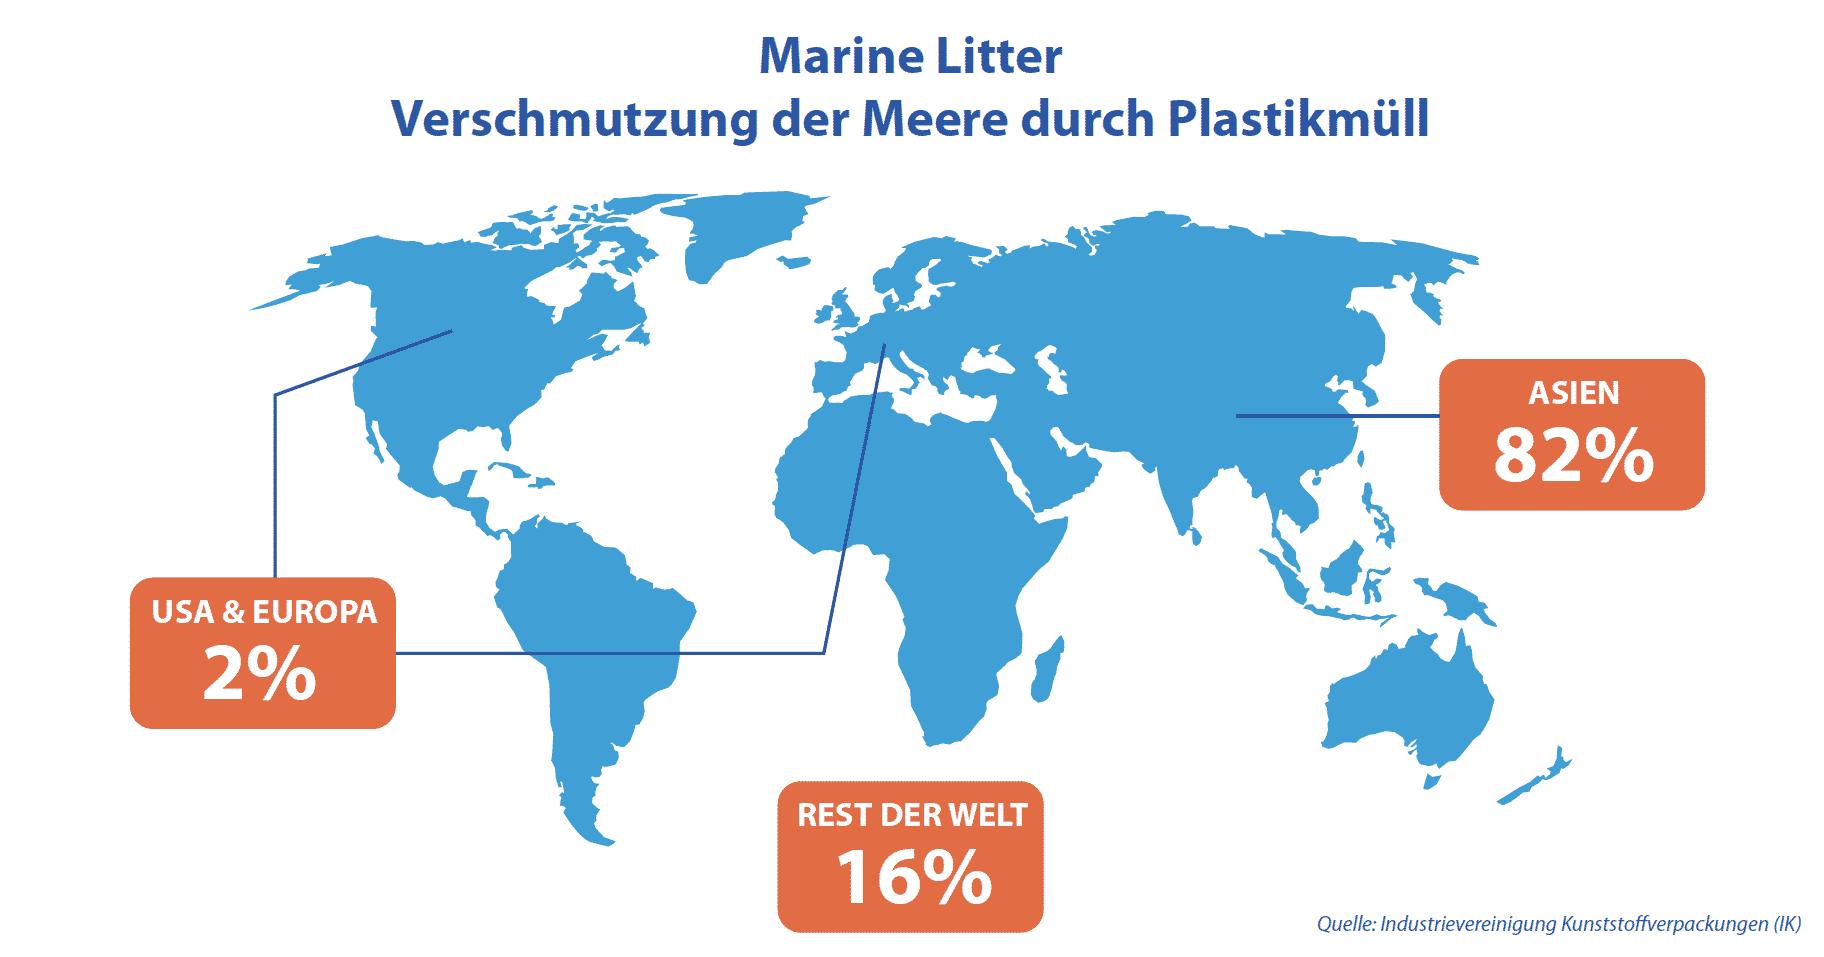 Plastik im Meer - wo geht es her Asien USA oder Europa - Marine Litter